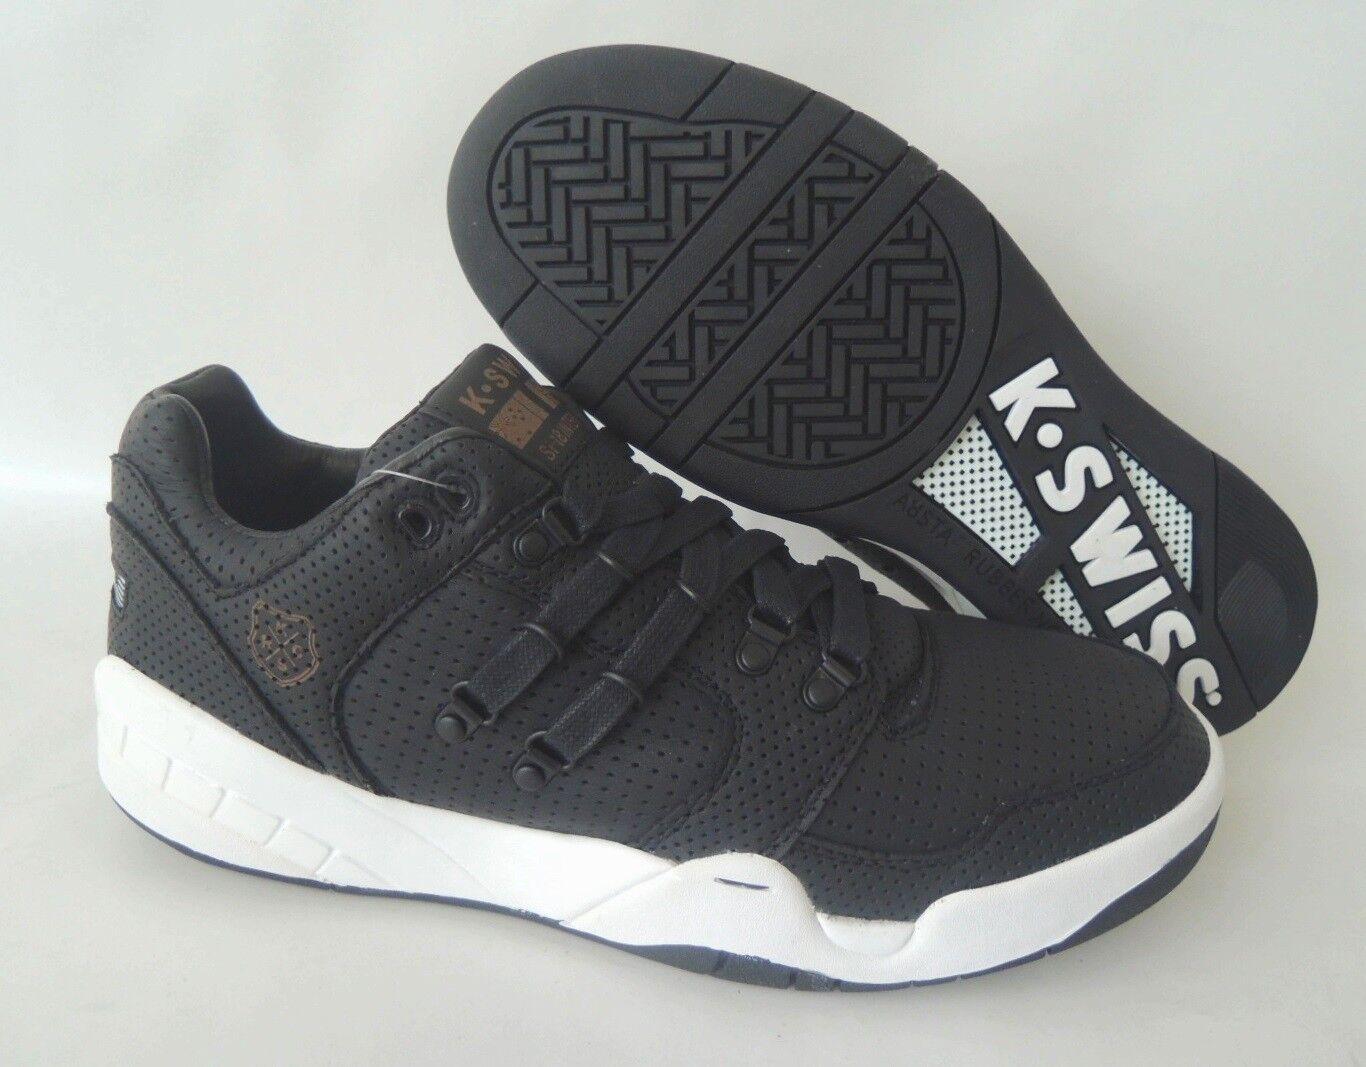 NEU K-Swiss Si-18 International Lux N 44,5 Sneaker Schuhe Boots 03790-002-M TOP